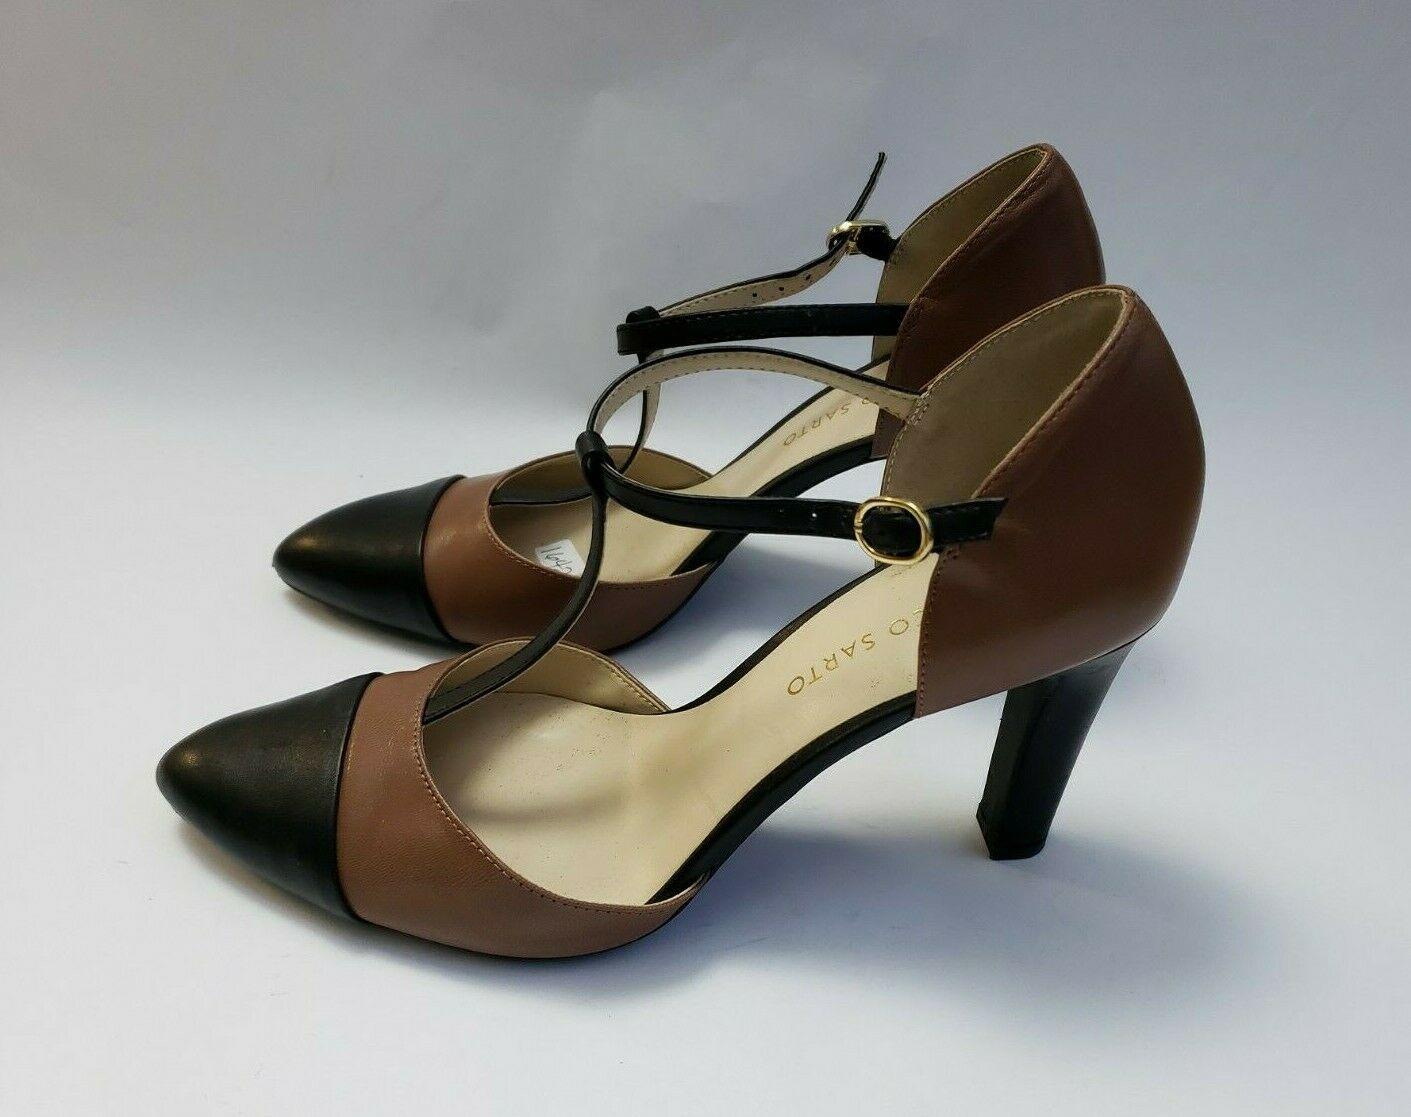 Franco Sarto Shoes Heels Brown Black T-Strap Tanda Womens Size 8.5 M image 3